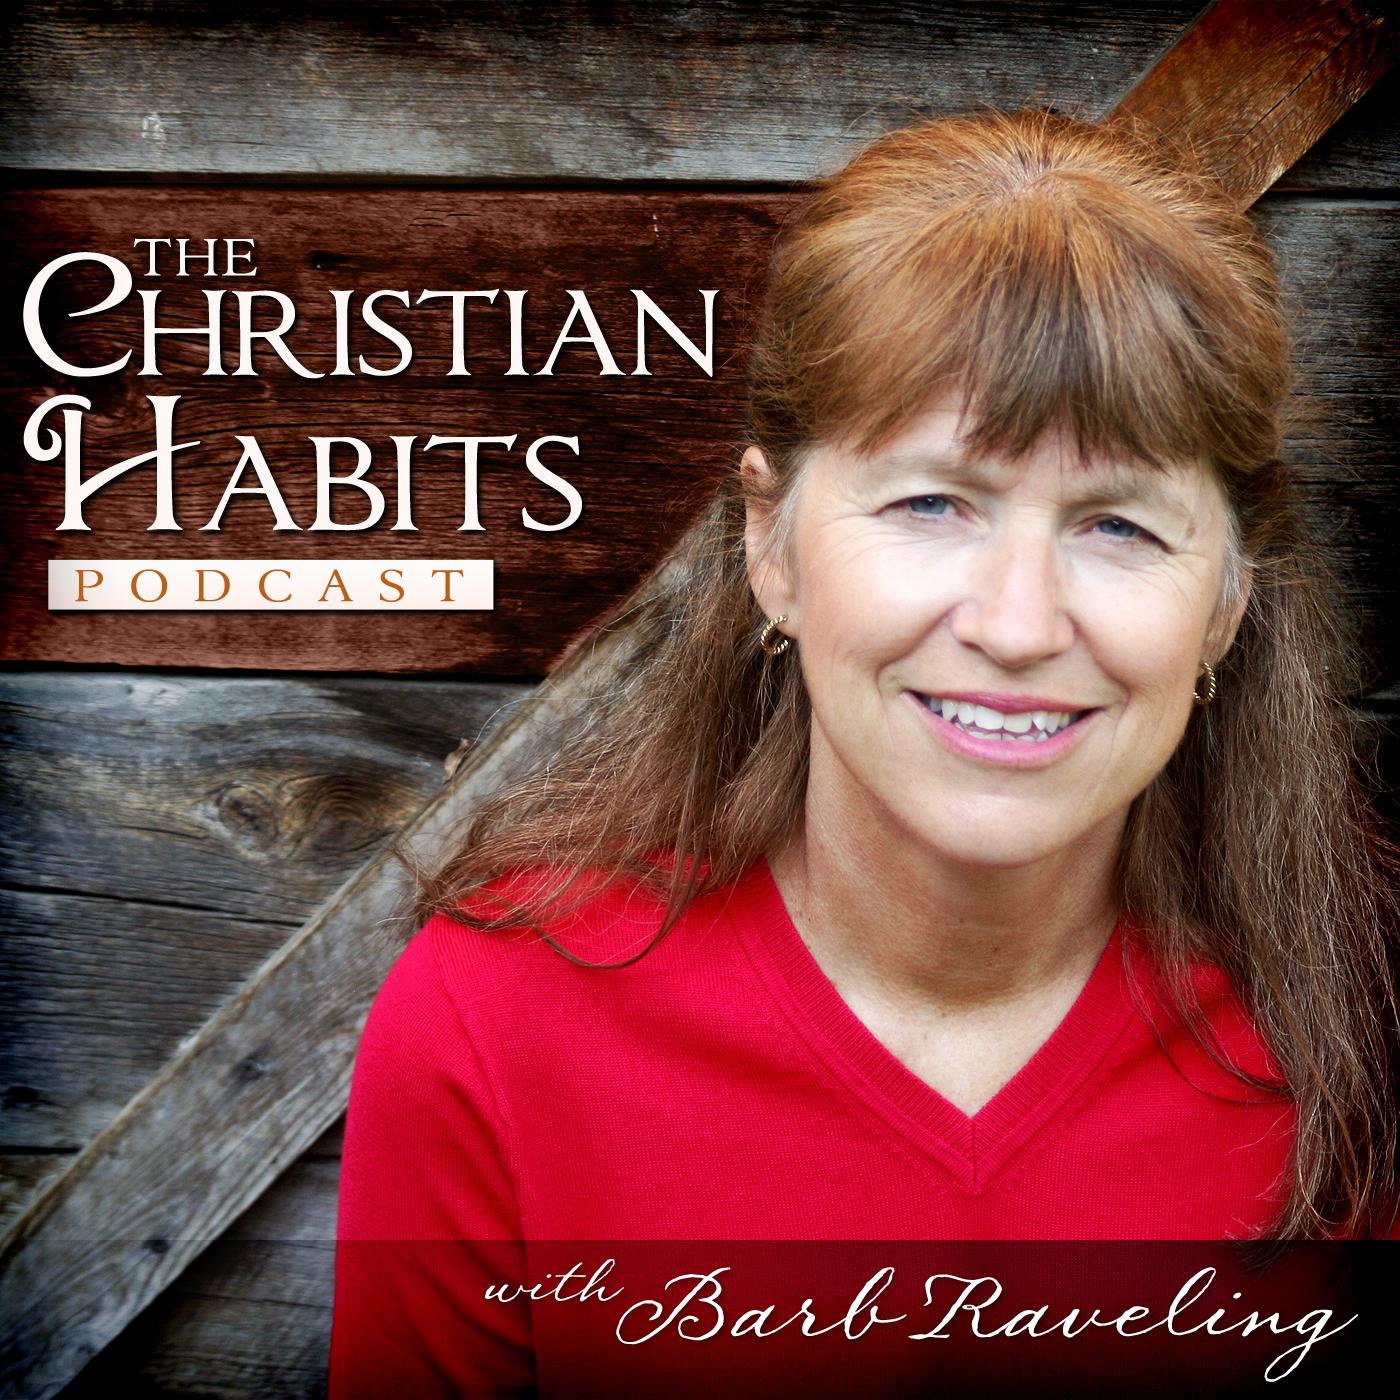 The Christian Habits Podcast logo